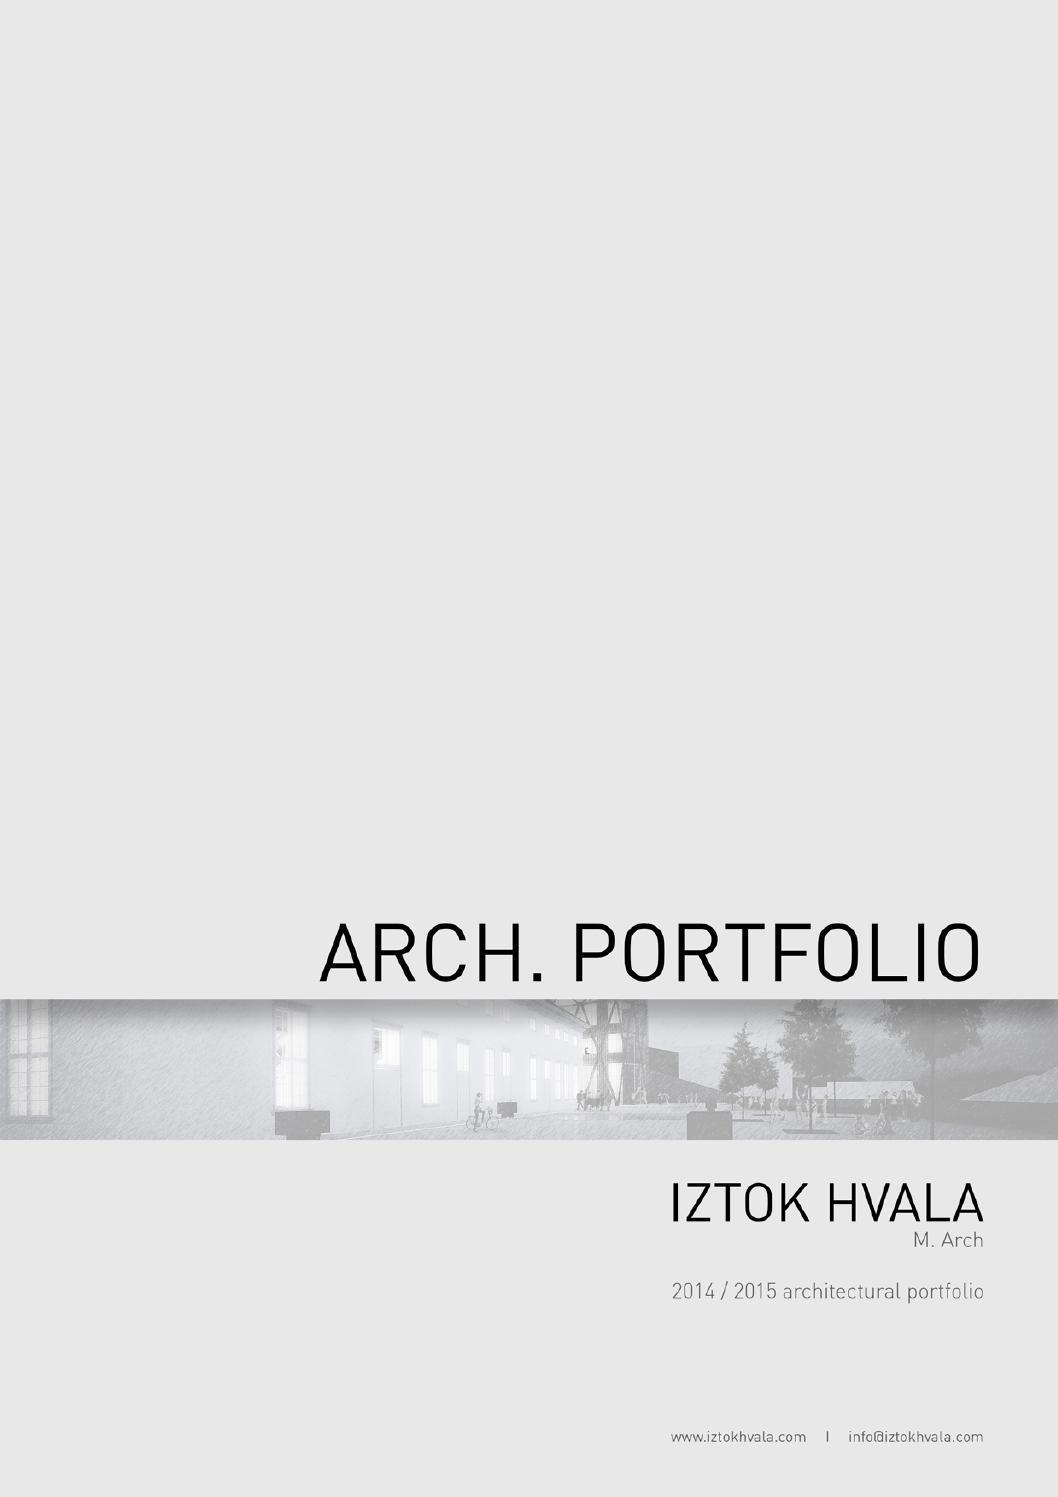 Book Cover Design Application ~ Iztok hvala architectural portfolio by issuu